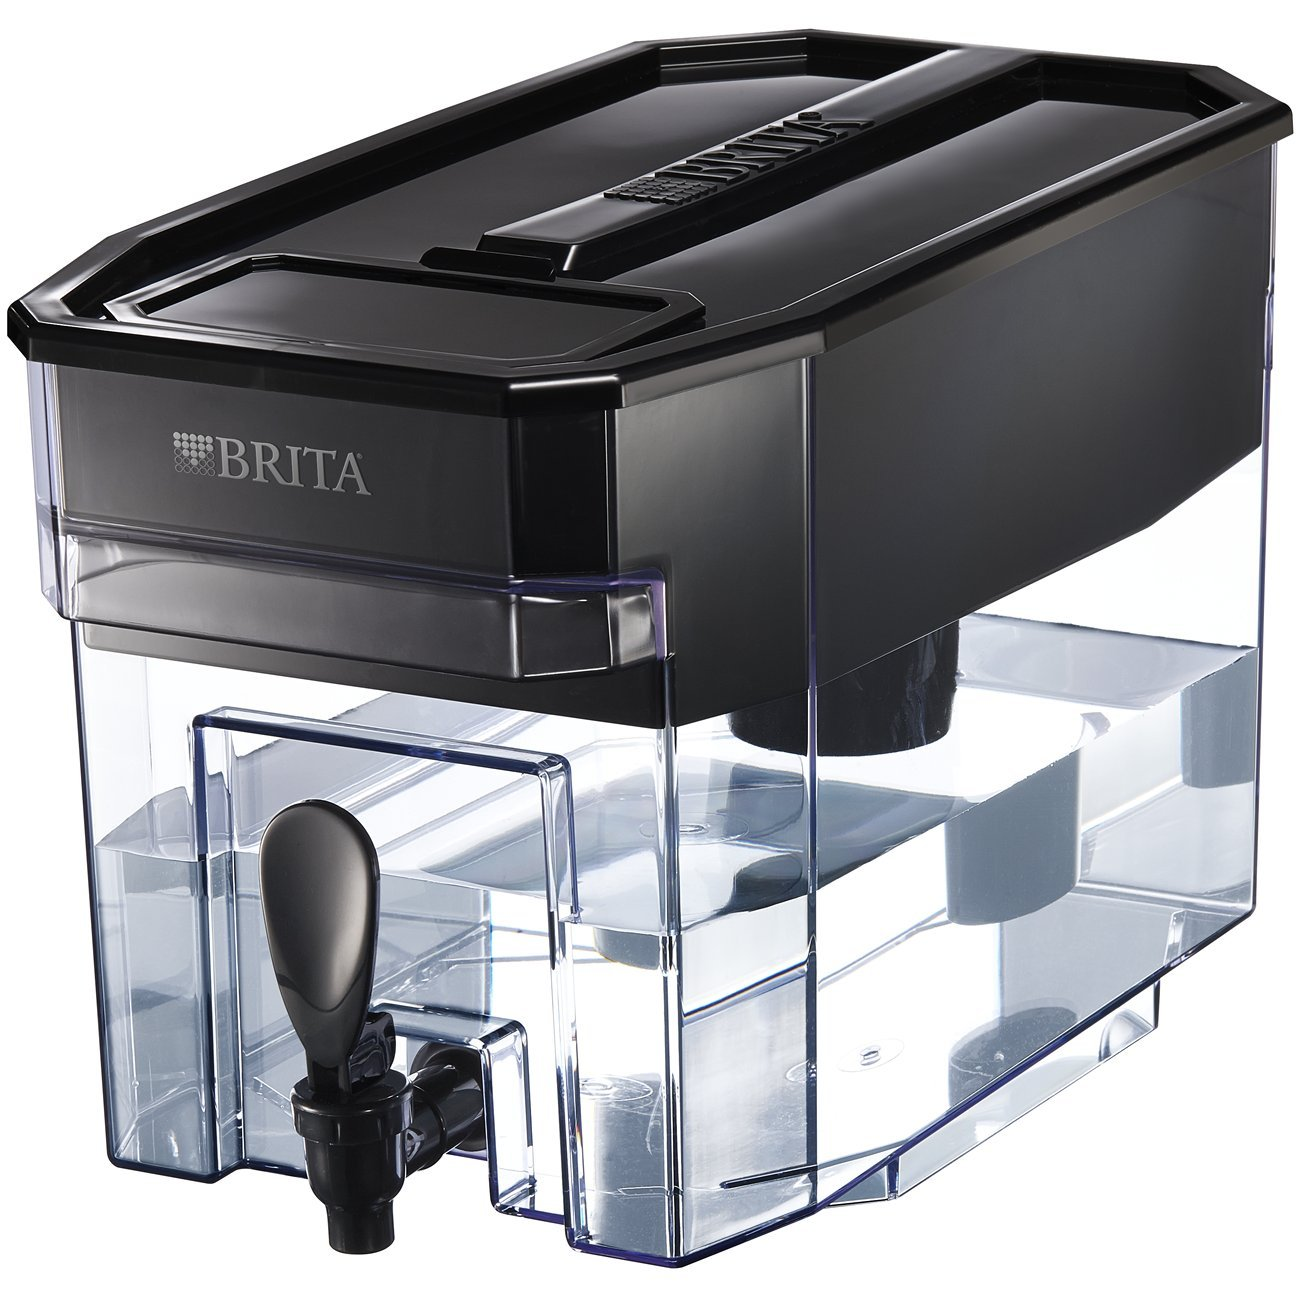 Brita Large 18 Cup UltraMax Water Dispenser and Filter - BPA Free ...